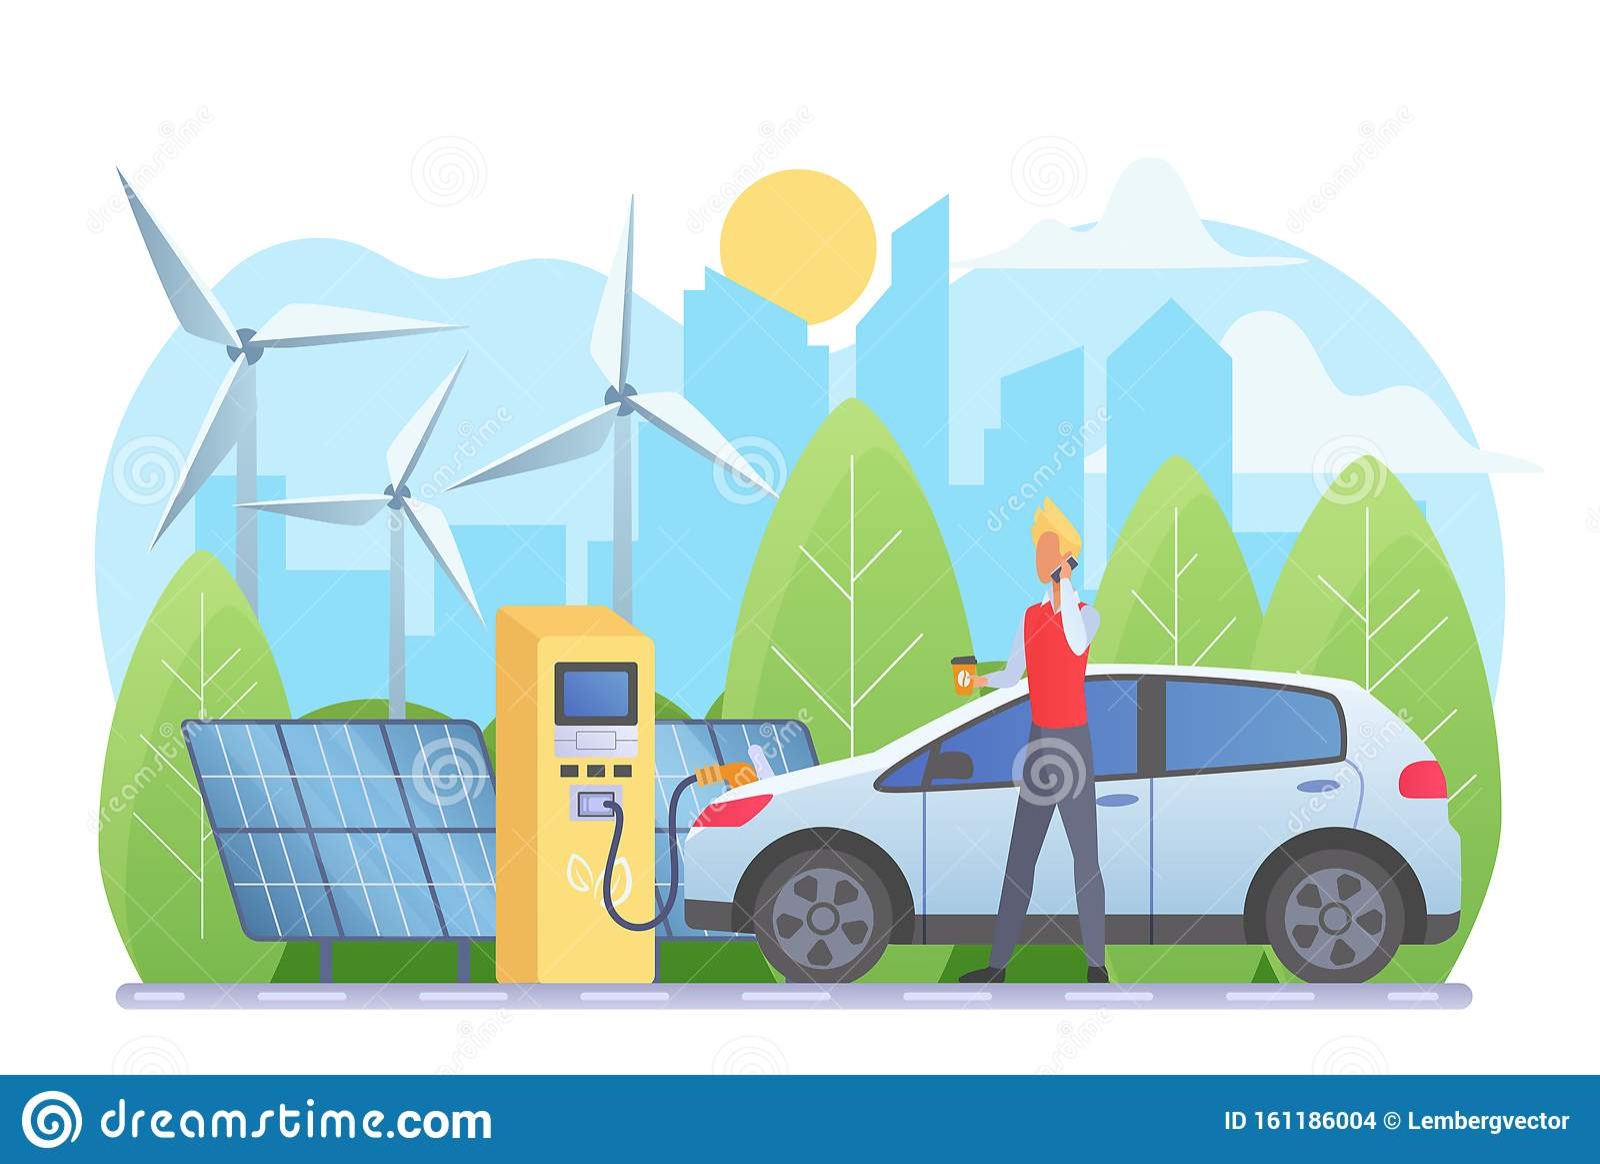 Alternative Energy Sources Vector Illustration